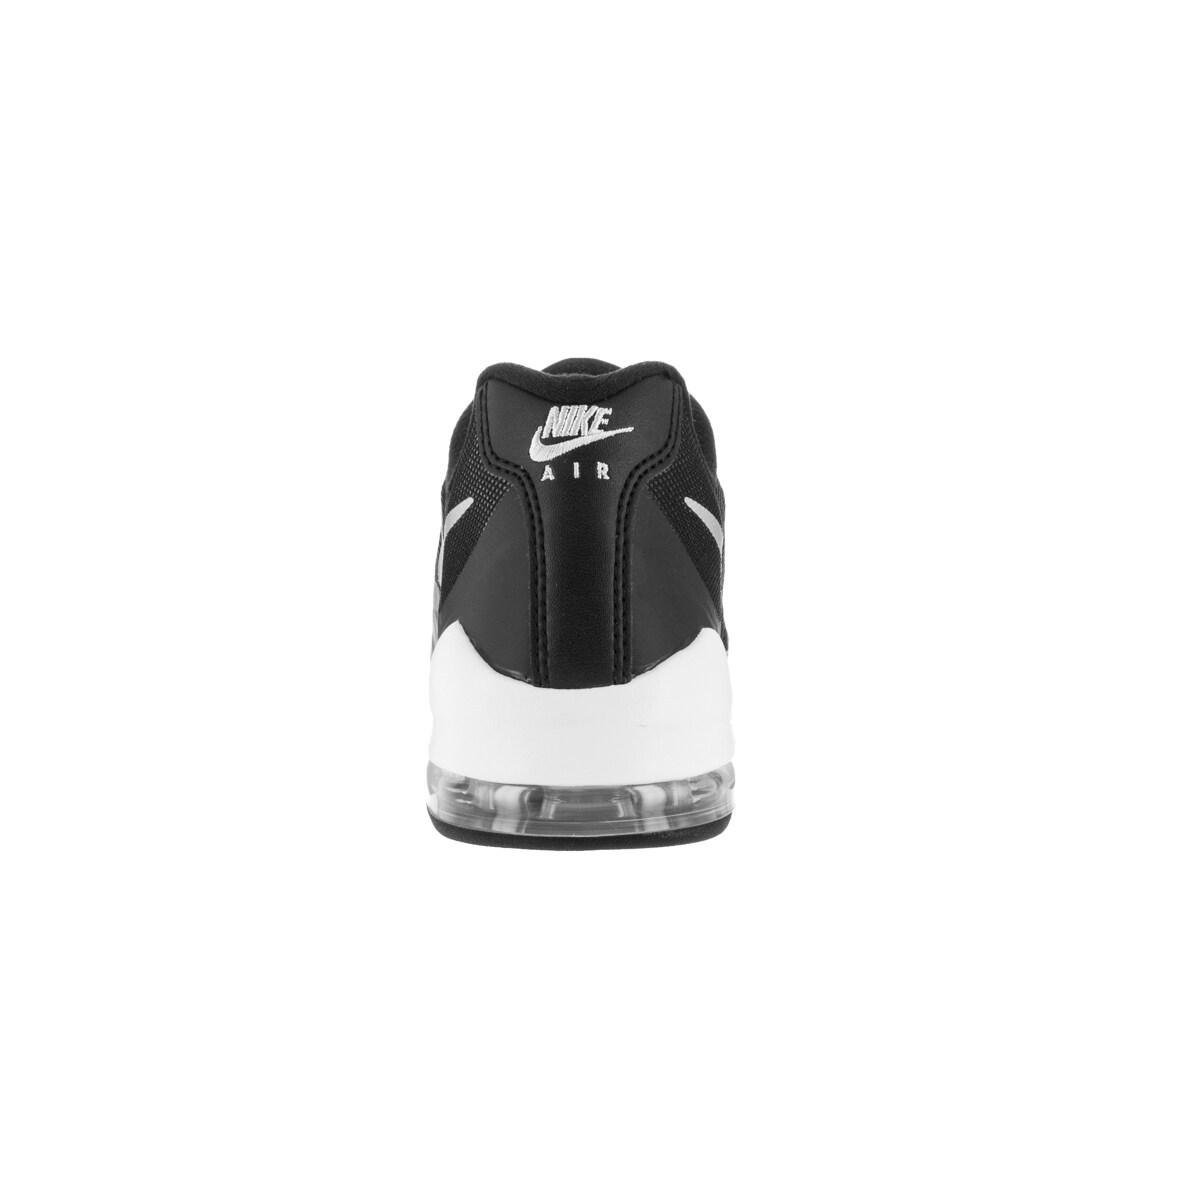 d73d6d193de8 Shop Nike Women s Air Max Invigor Black Metallic Silver White Running Shoe  - Free Shipping Today - Overstock - 12321528